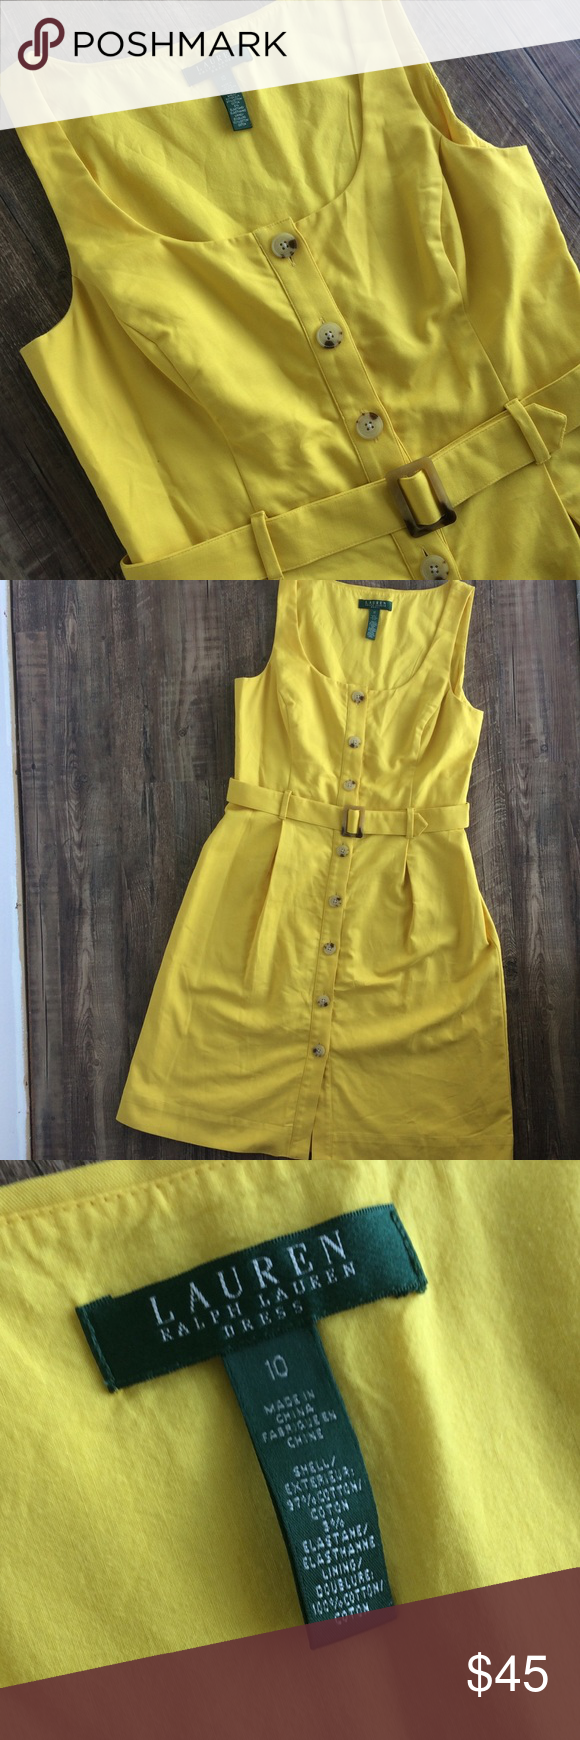 Robe jaune ralph lauren